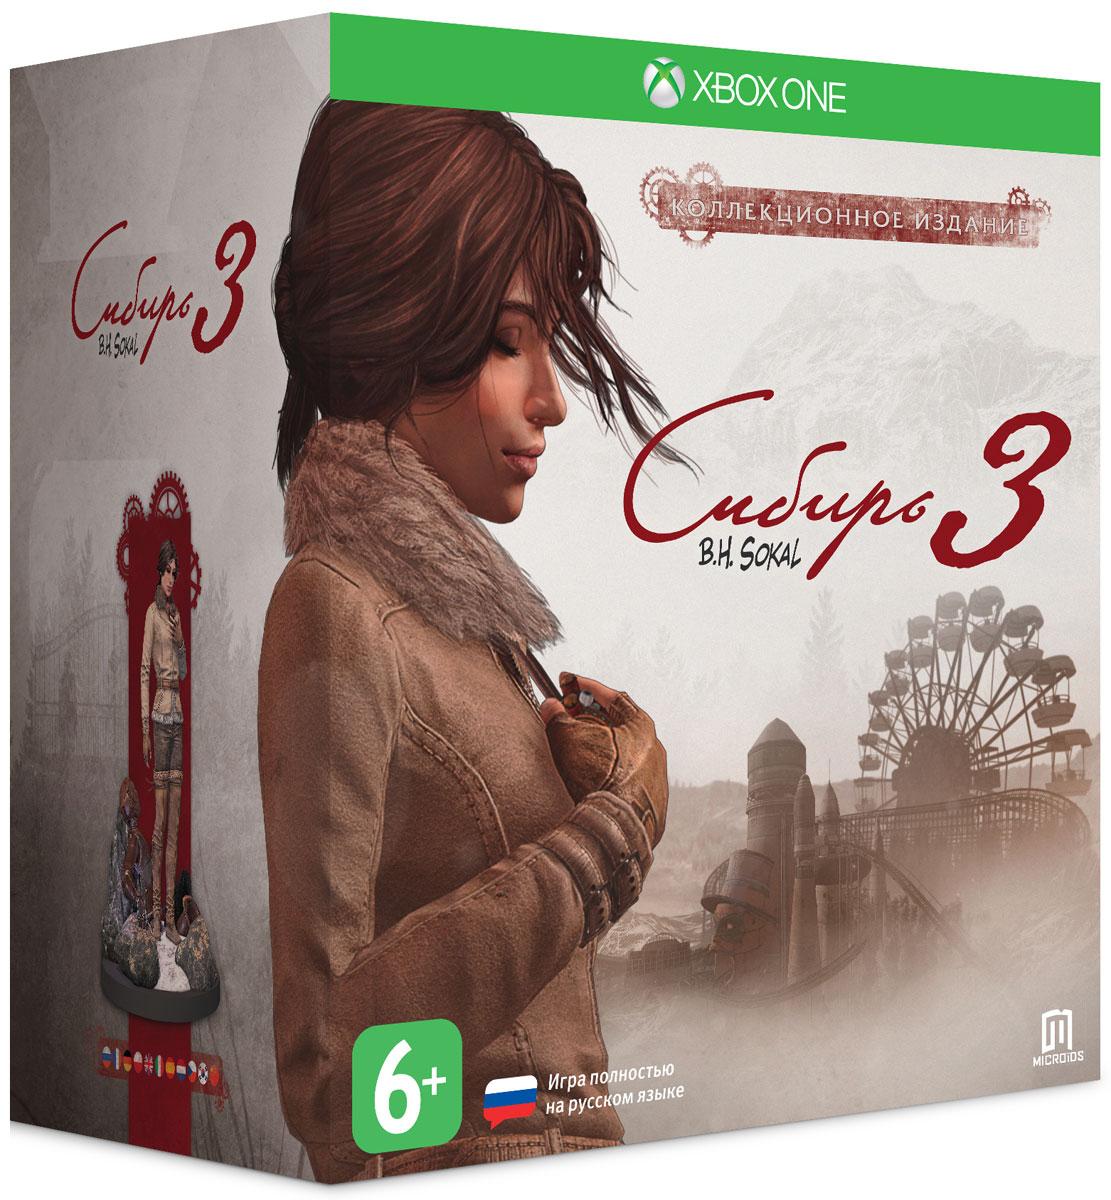 Сибирь 3. Коллекционное издание (Xbox One), Microids